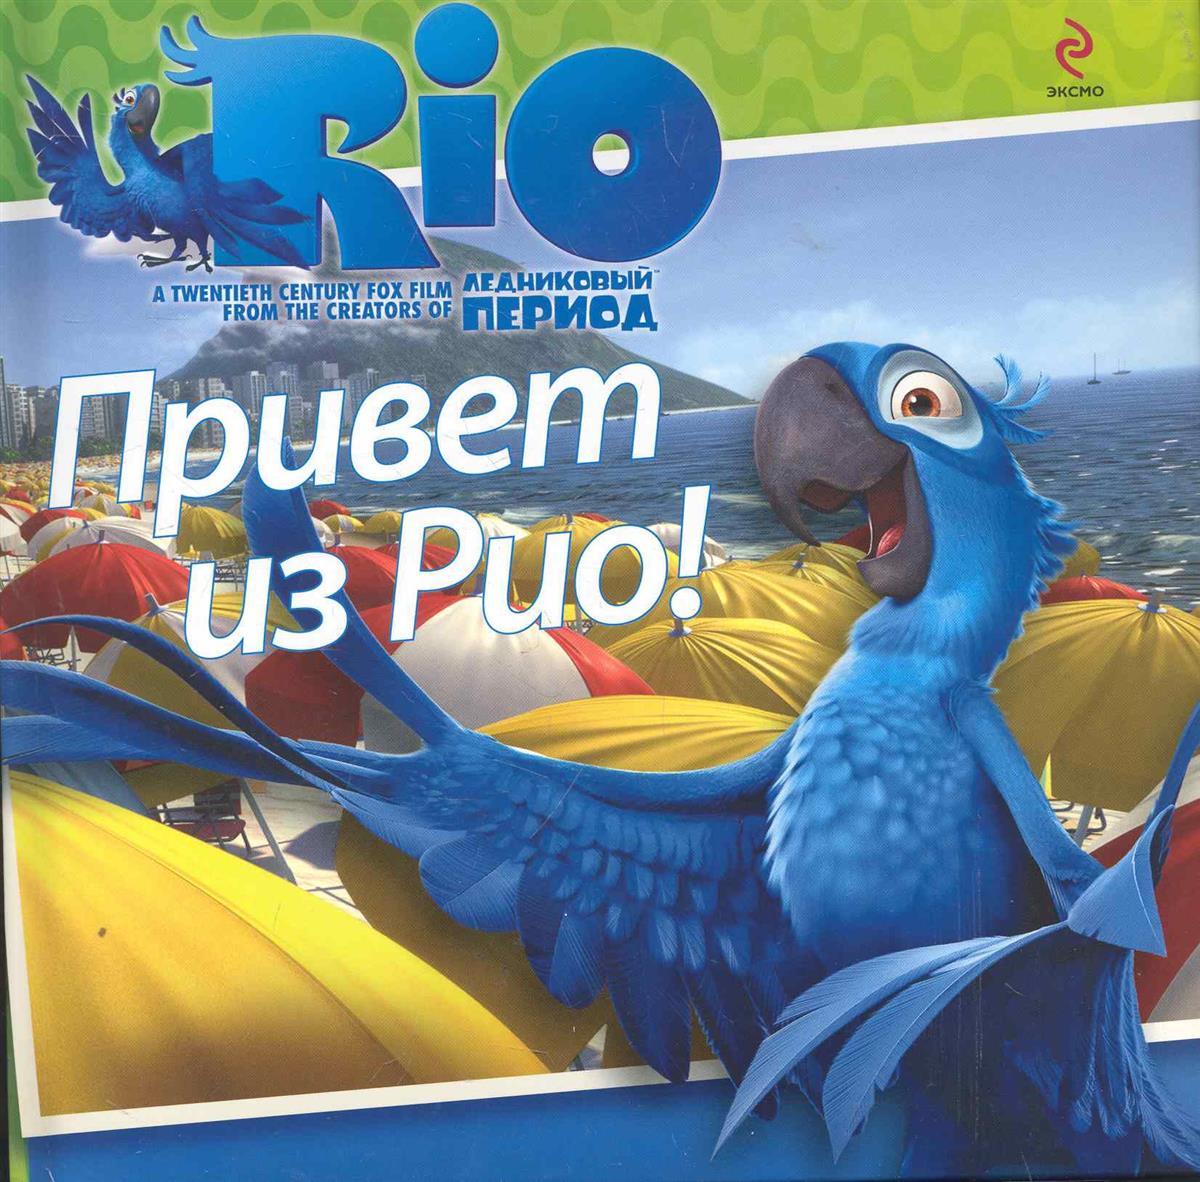 Долгачева О. (пер.) РИО Привет из Рио